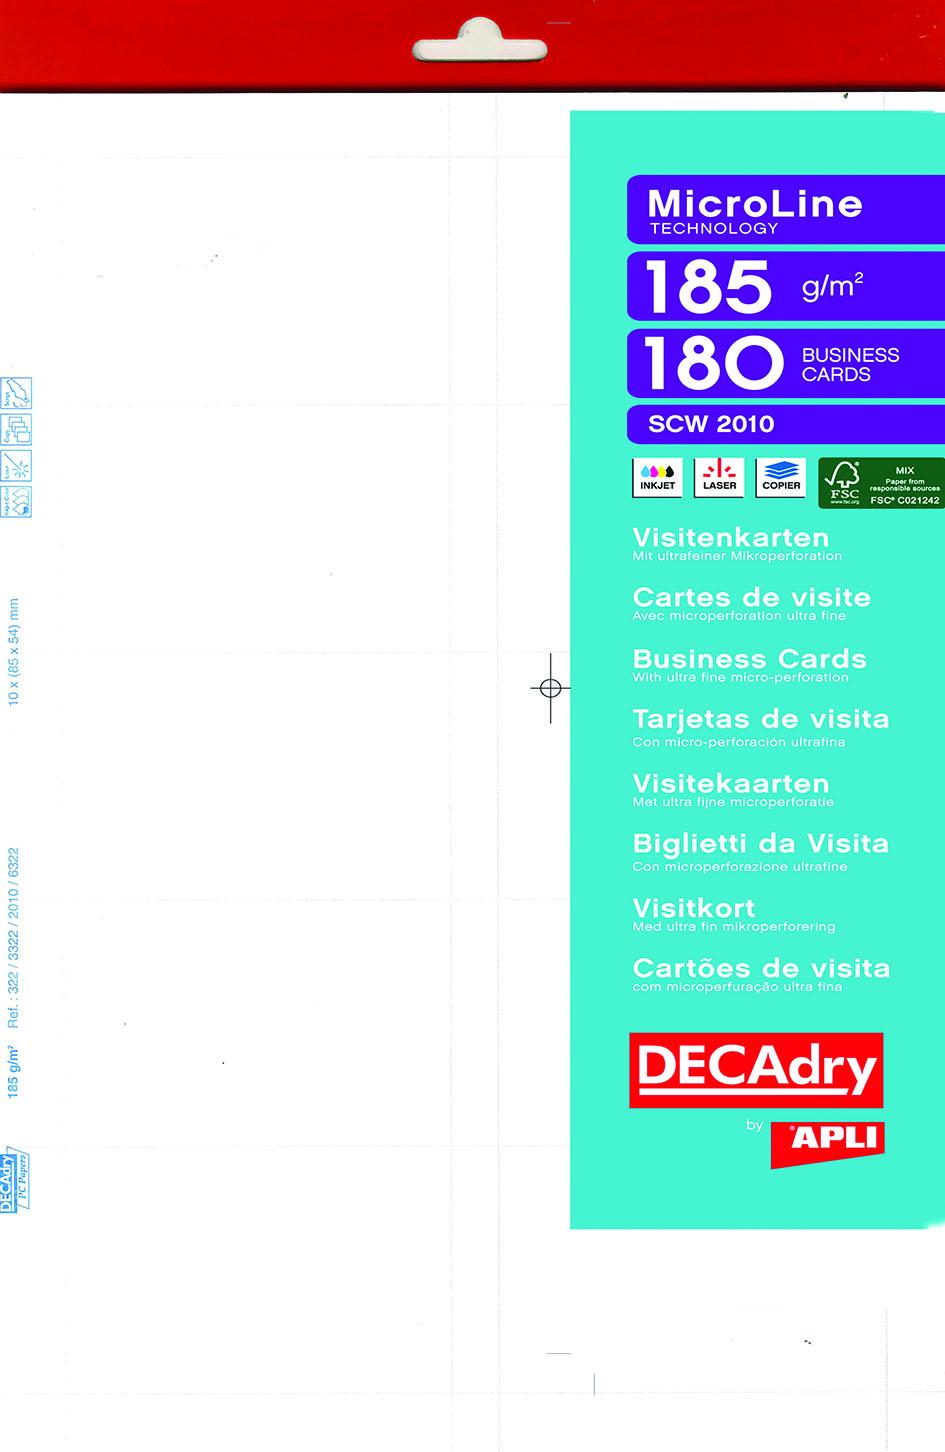 Fabricant APLI AGIPA Logiciel Cartes De Visite Decadry Awesome Outstanding